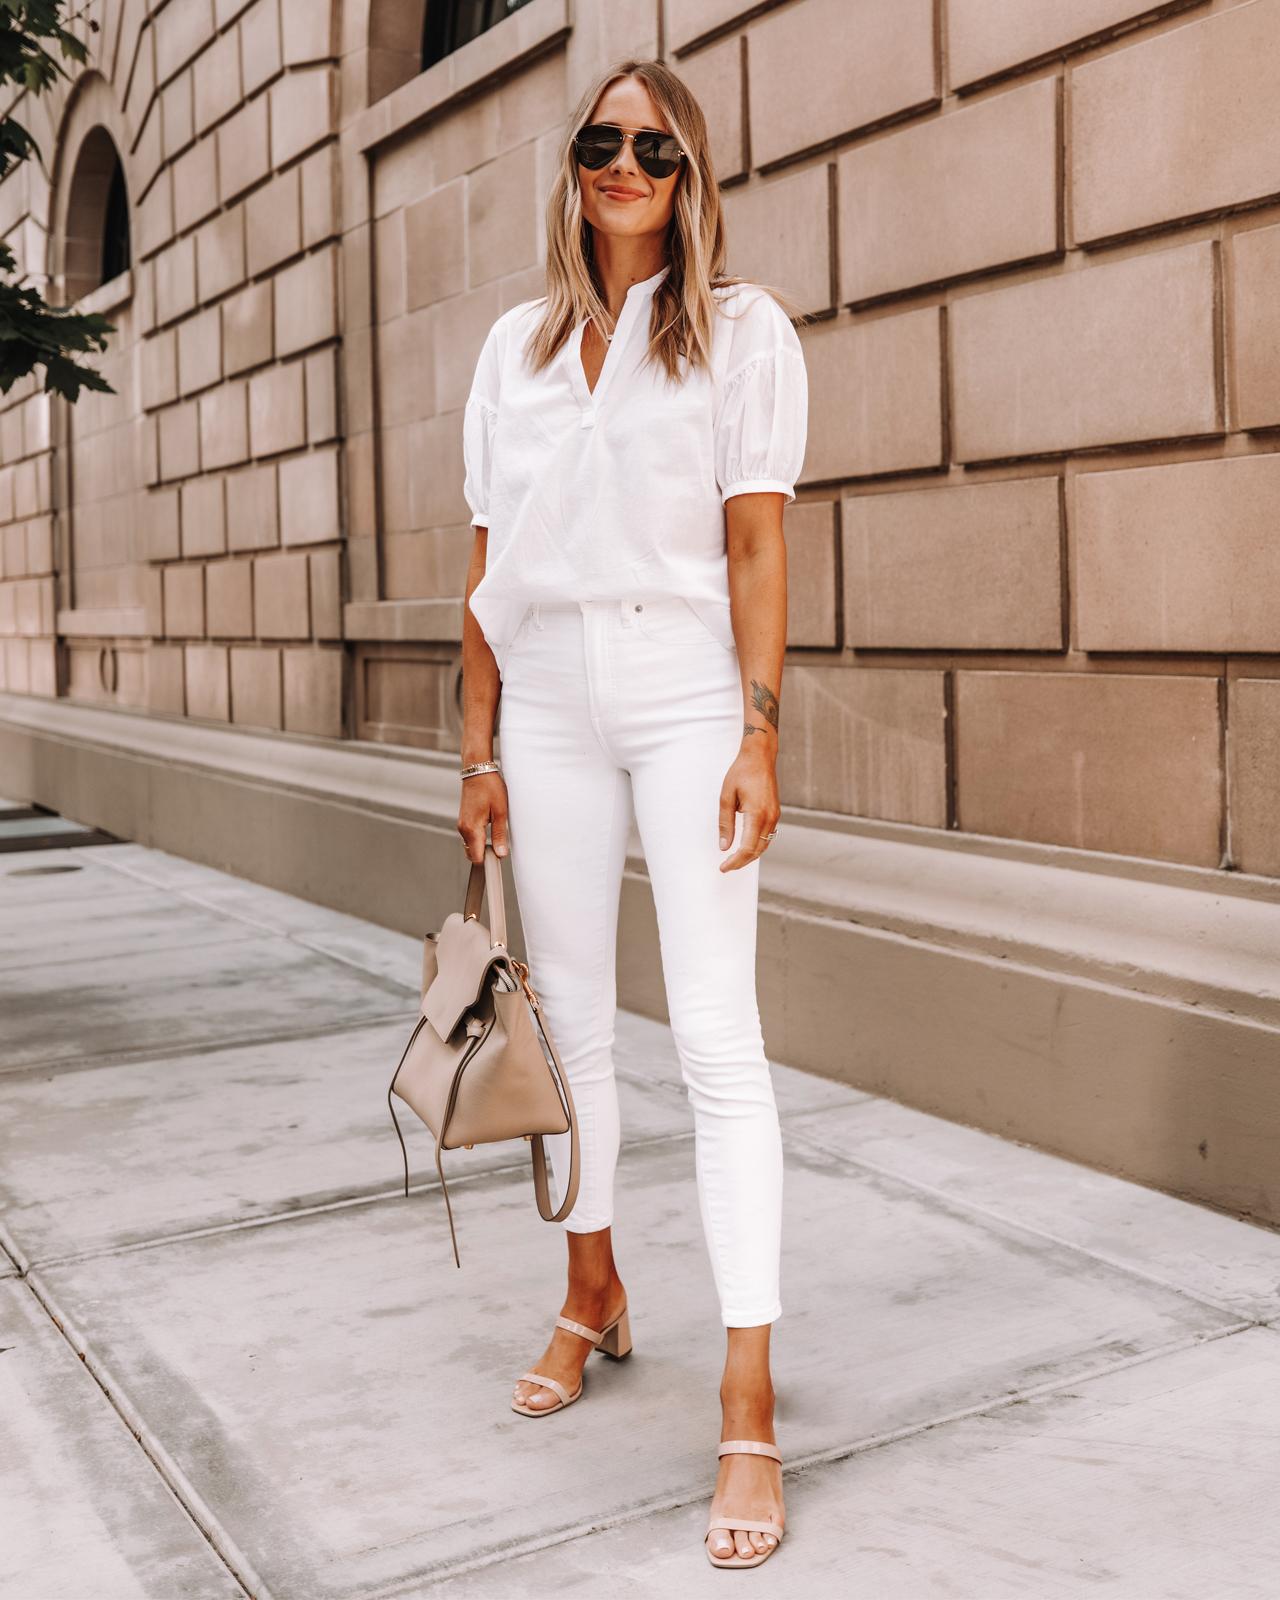 Fashion Jackson Wearing Everlane White Puff Sleeve Top Everlane White Skinny Jeans Beige Sandals